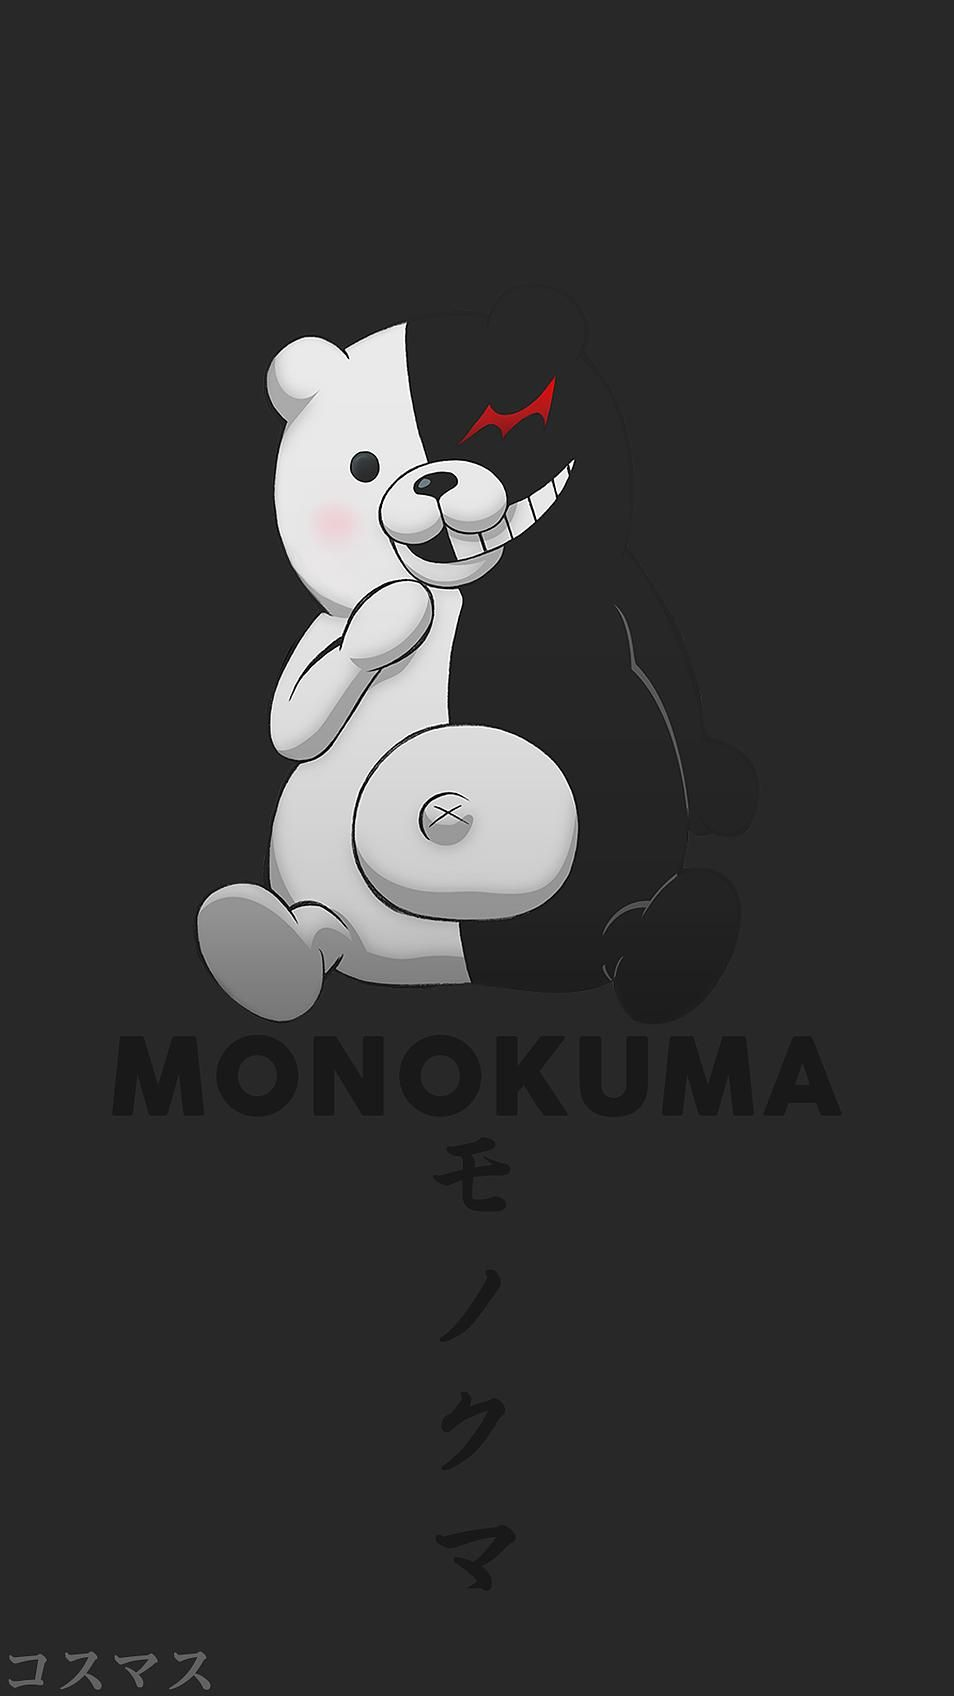 Monokuma Cute Anime Wallpaper Anime Wallpaper Phone Anime Wallpaper